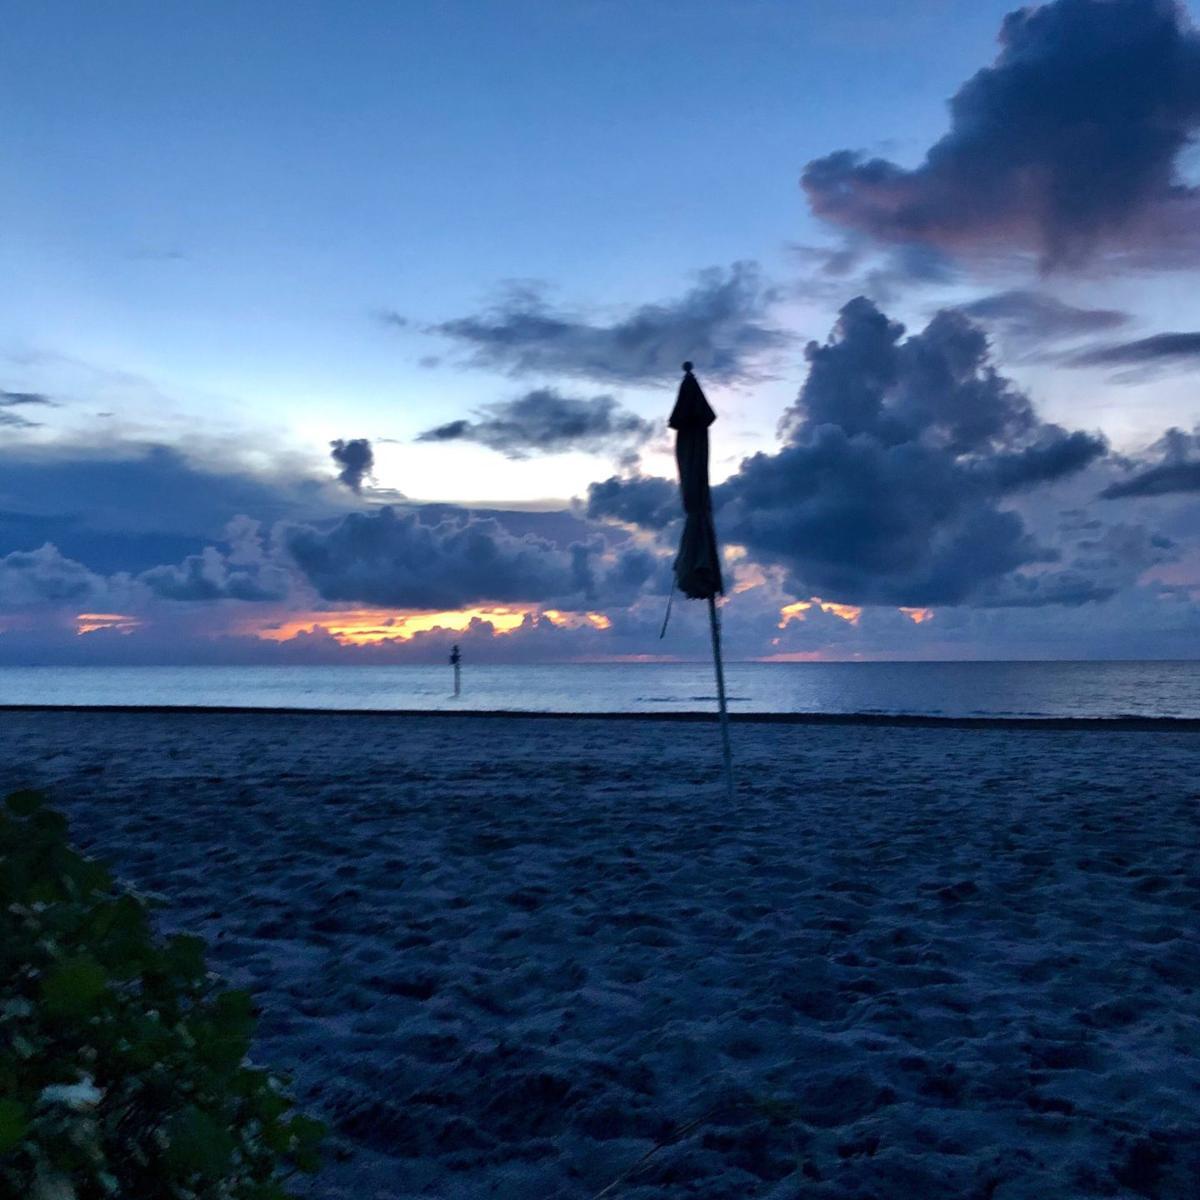 Sunset off Key Colony beach